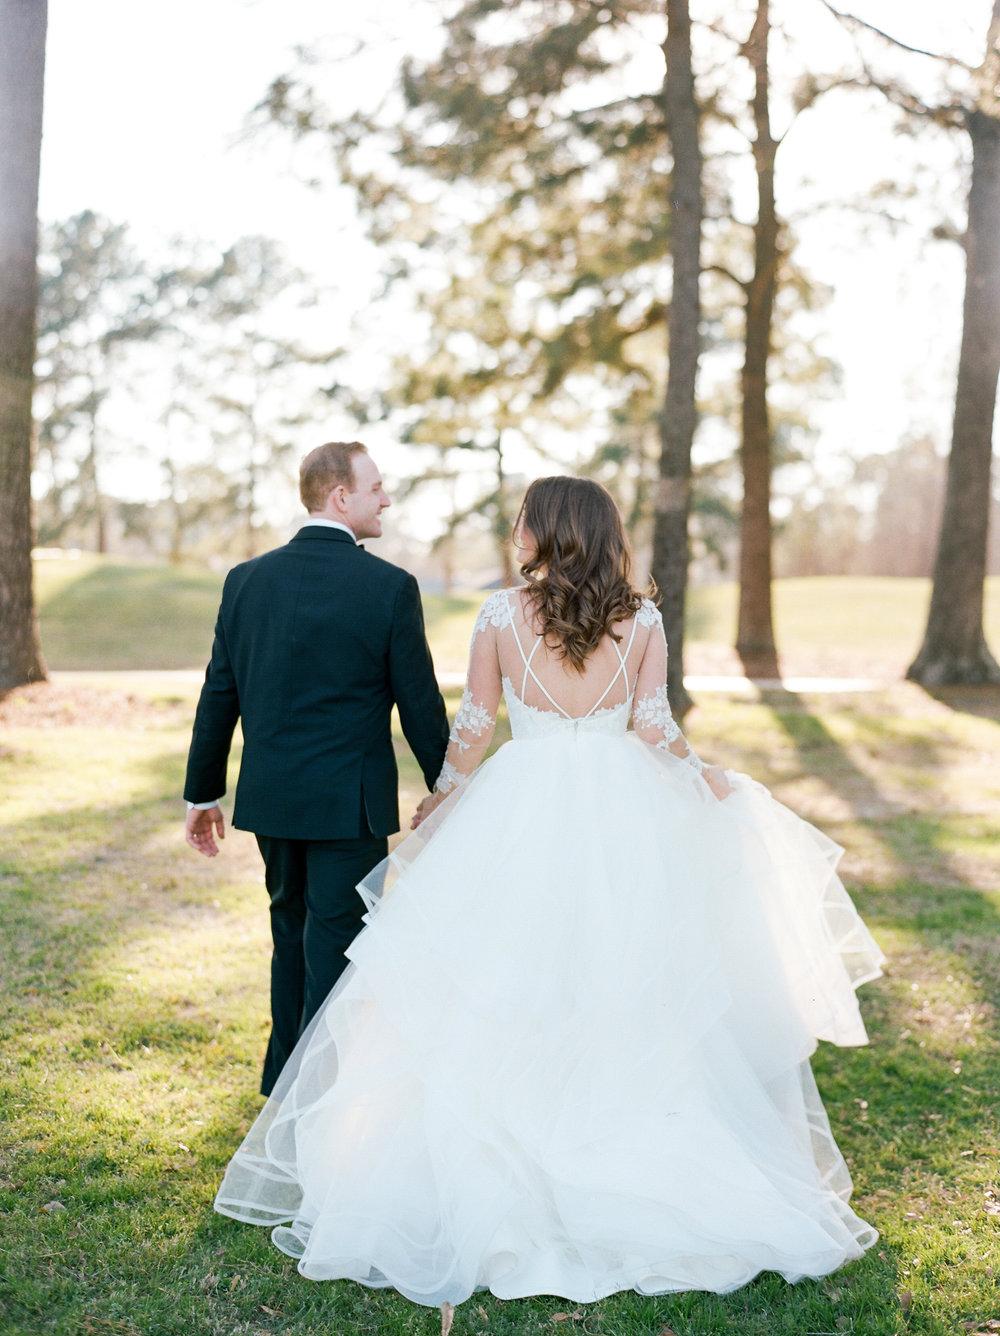 Houston-Wedding-Photographer-Style-Me-Pretty-St-Anne-Catholic-Church-Wedding-The-Woodlands-Country-Club-Palmer-Course-Austin-Wedding-photographer-fine-art-film-22.jpg